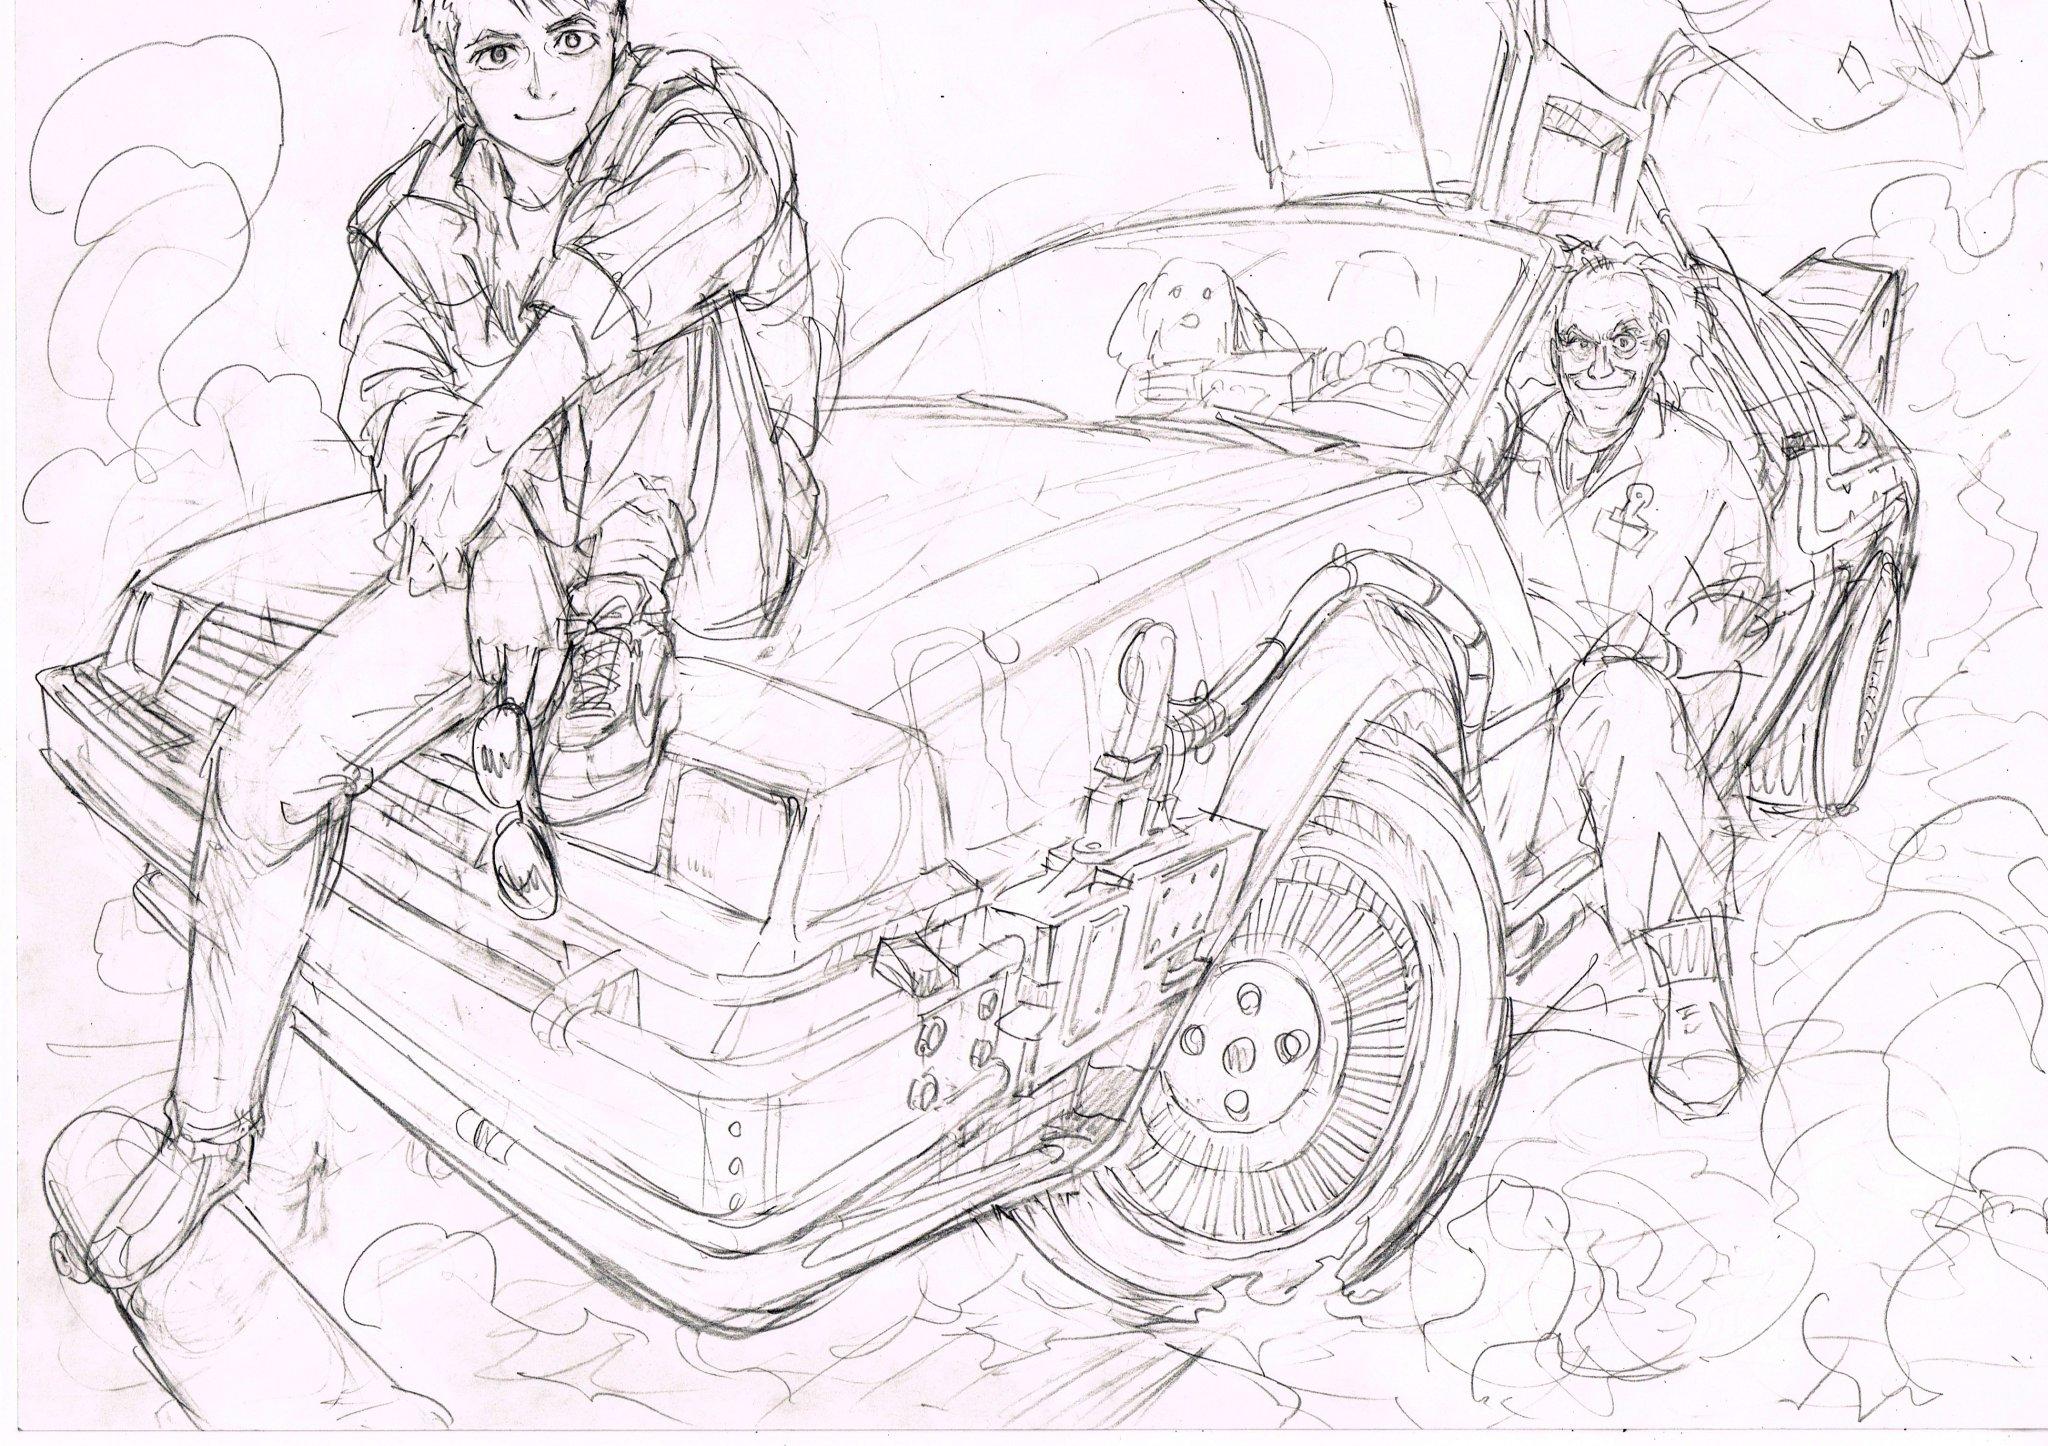 Retour vers le futur adapté en manga par Yusuke Murata ! DVLo0n8UQAEWfnQ